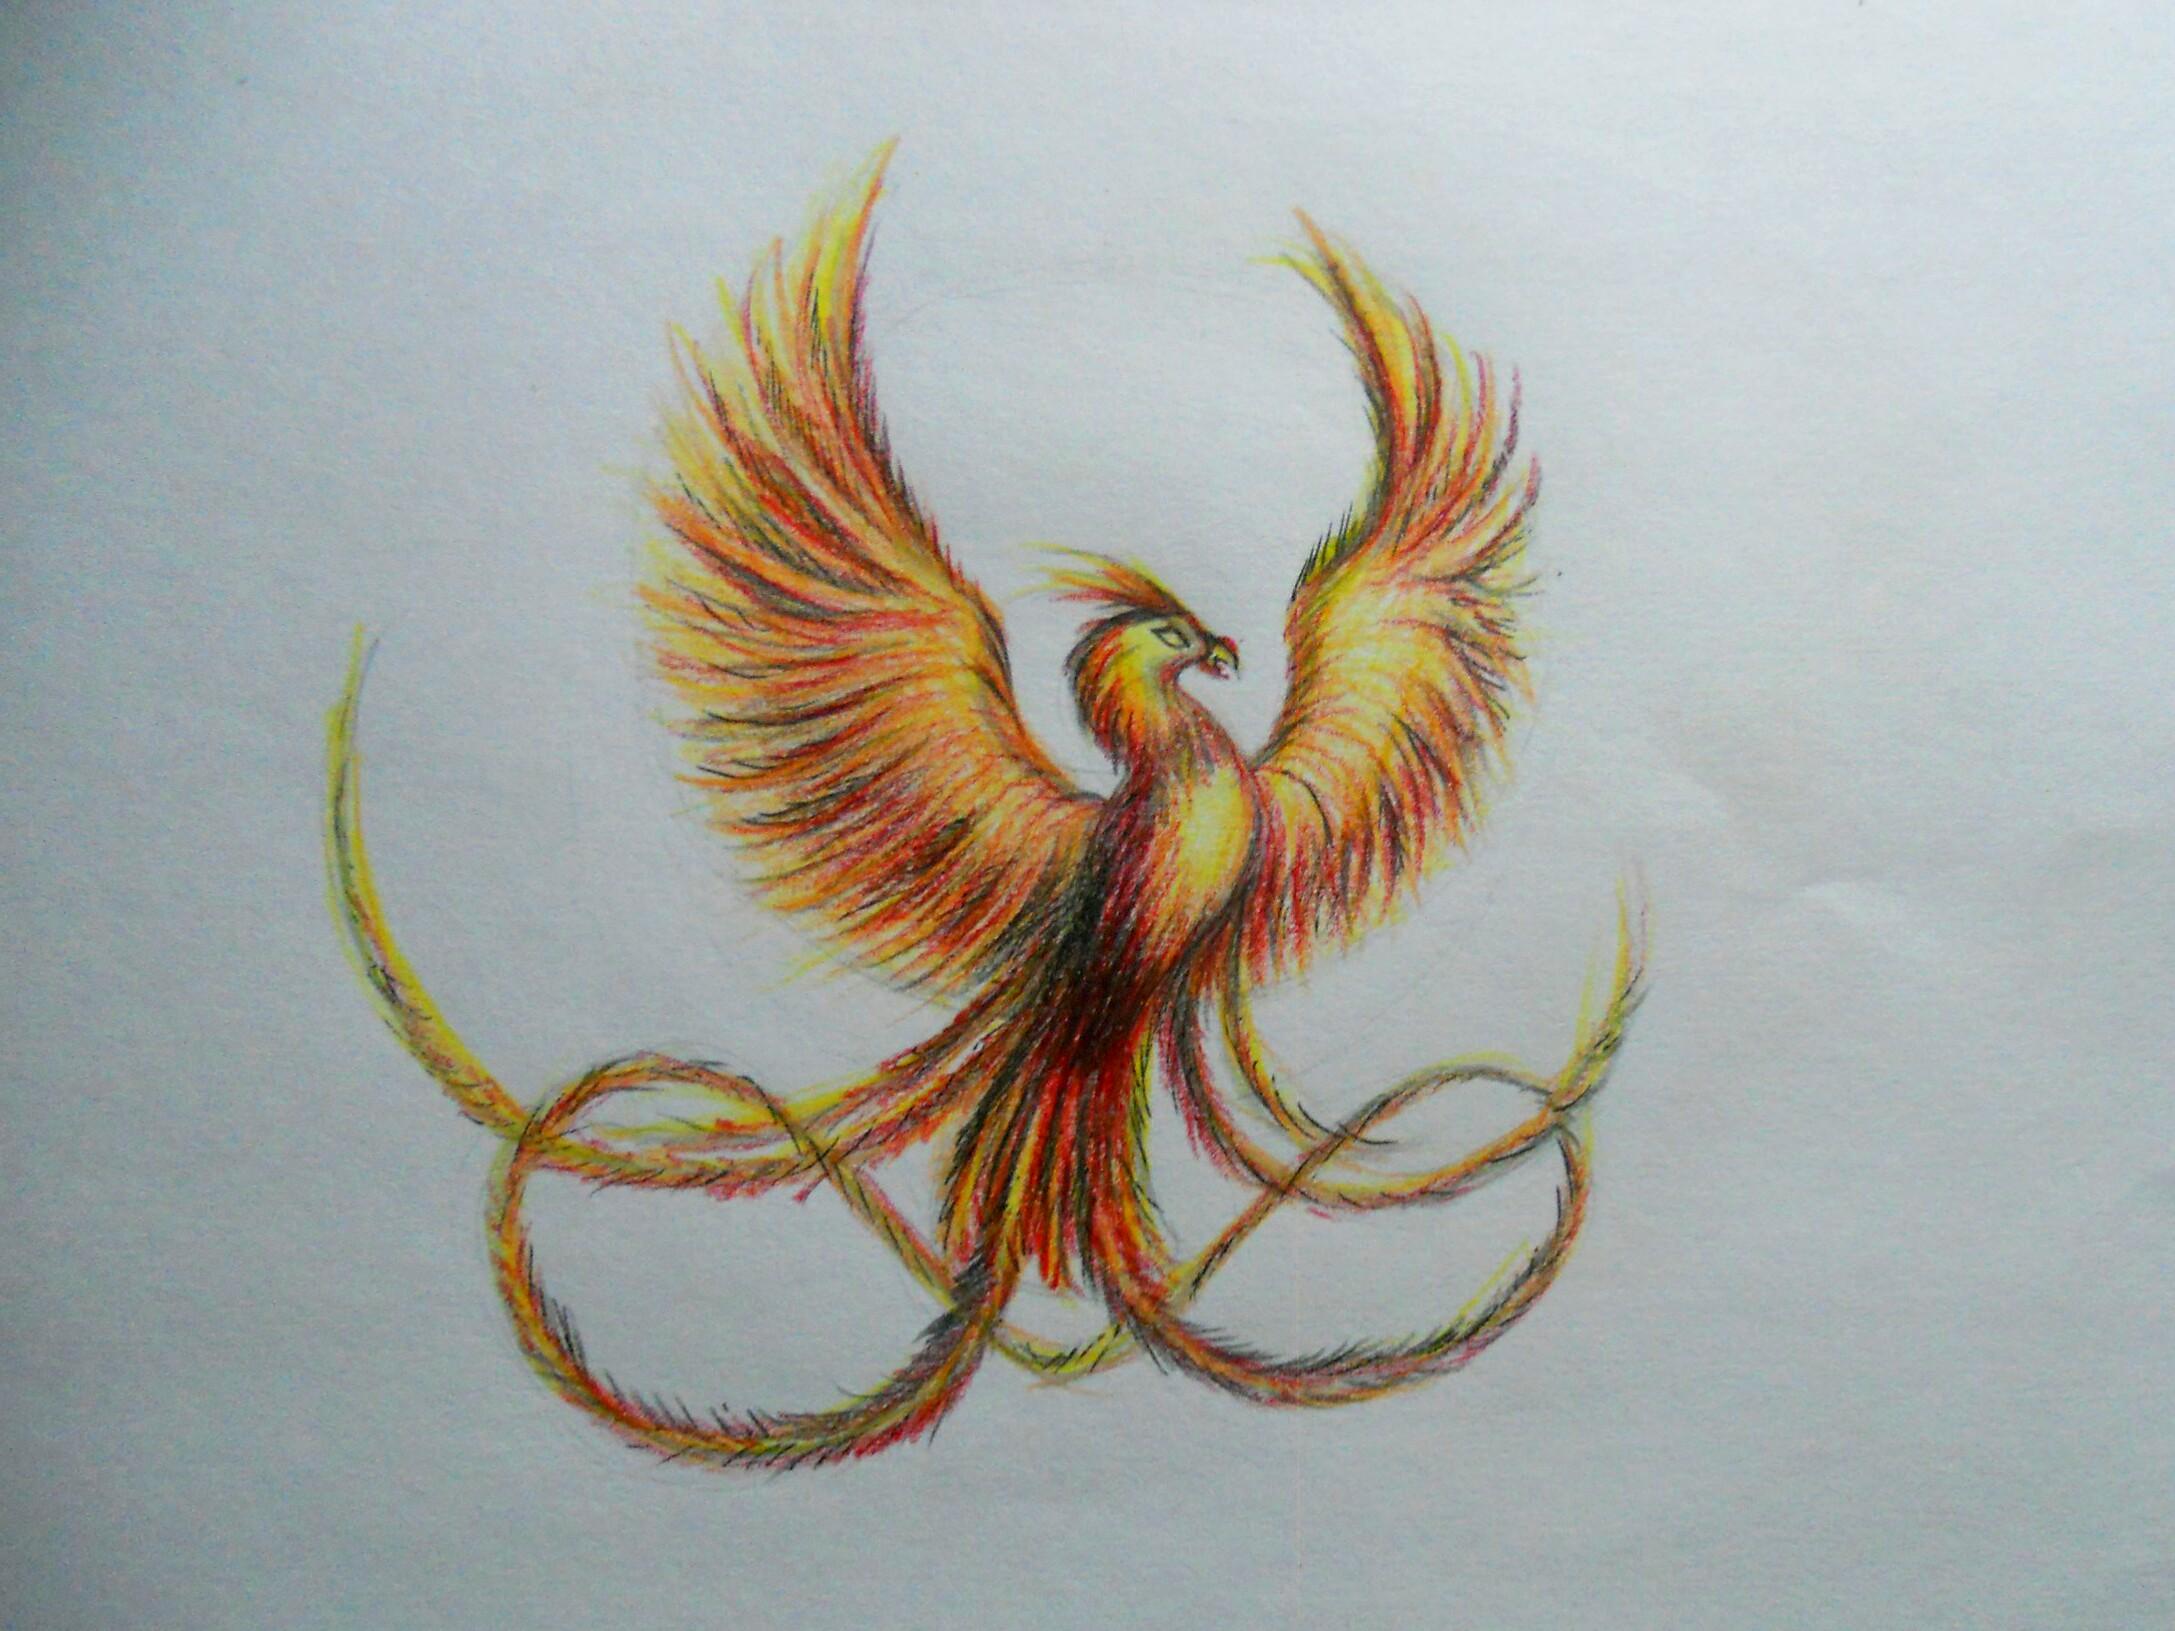 нарисованный феникс